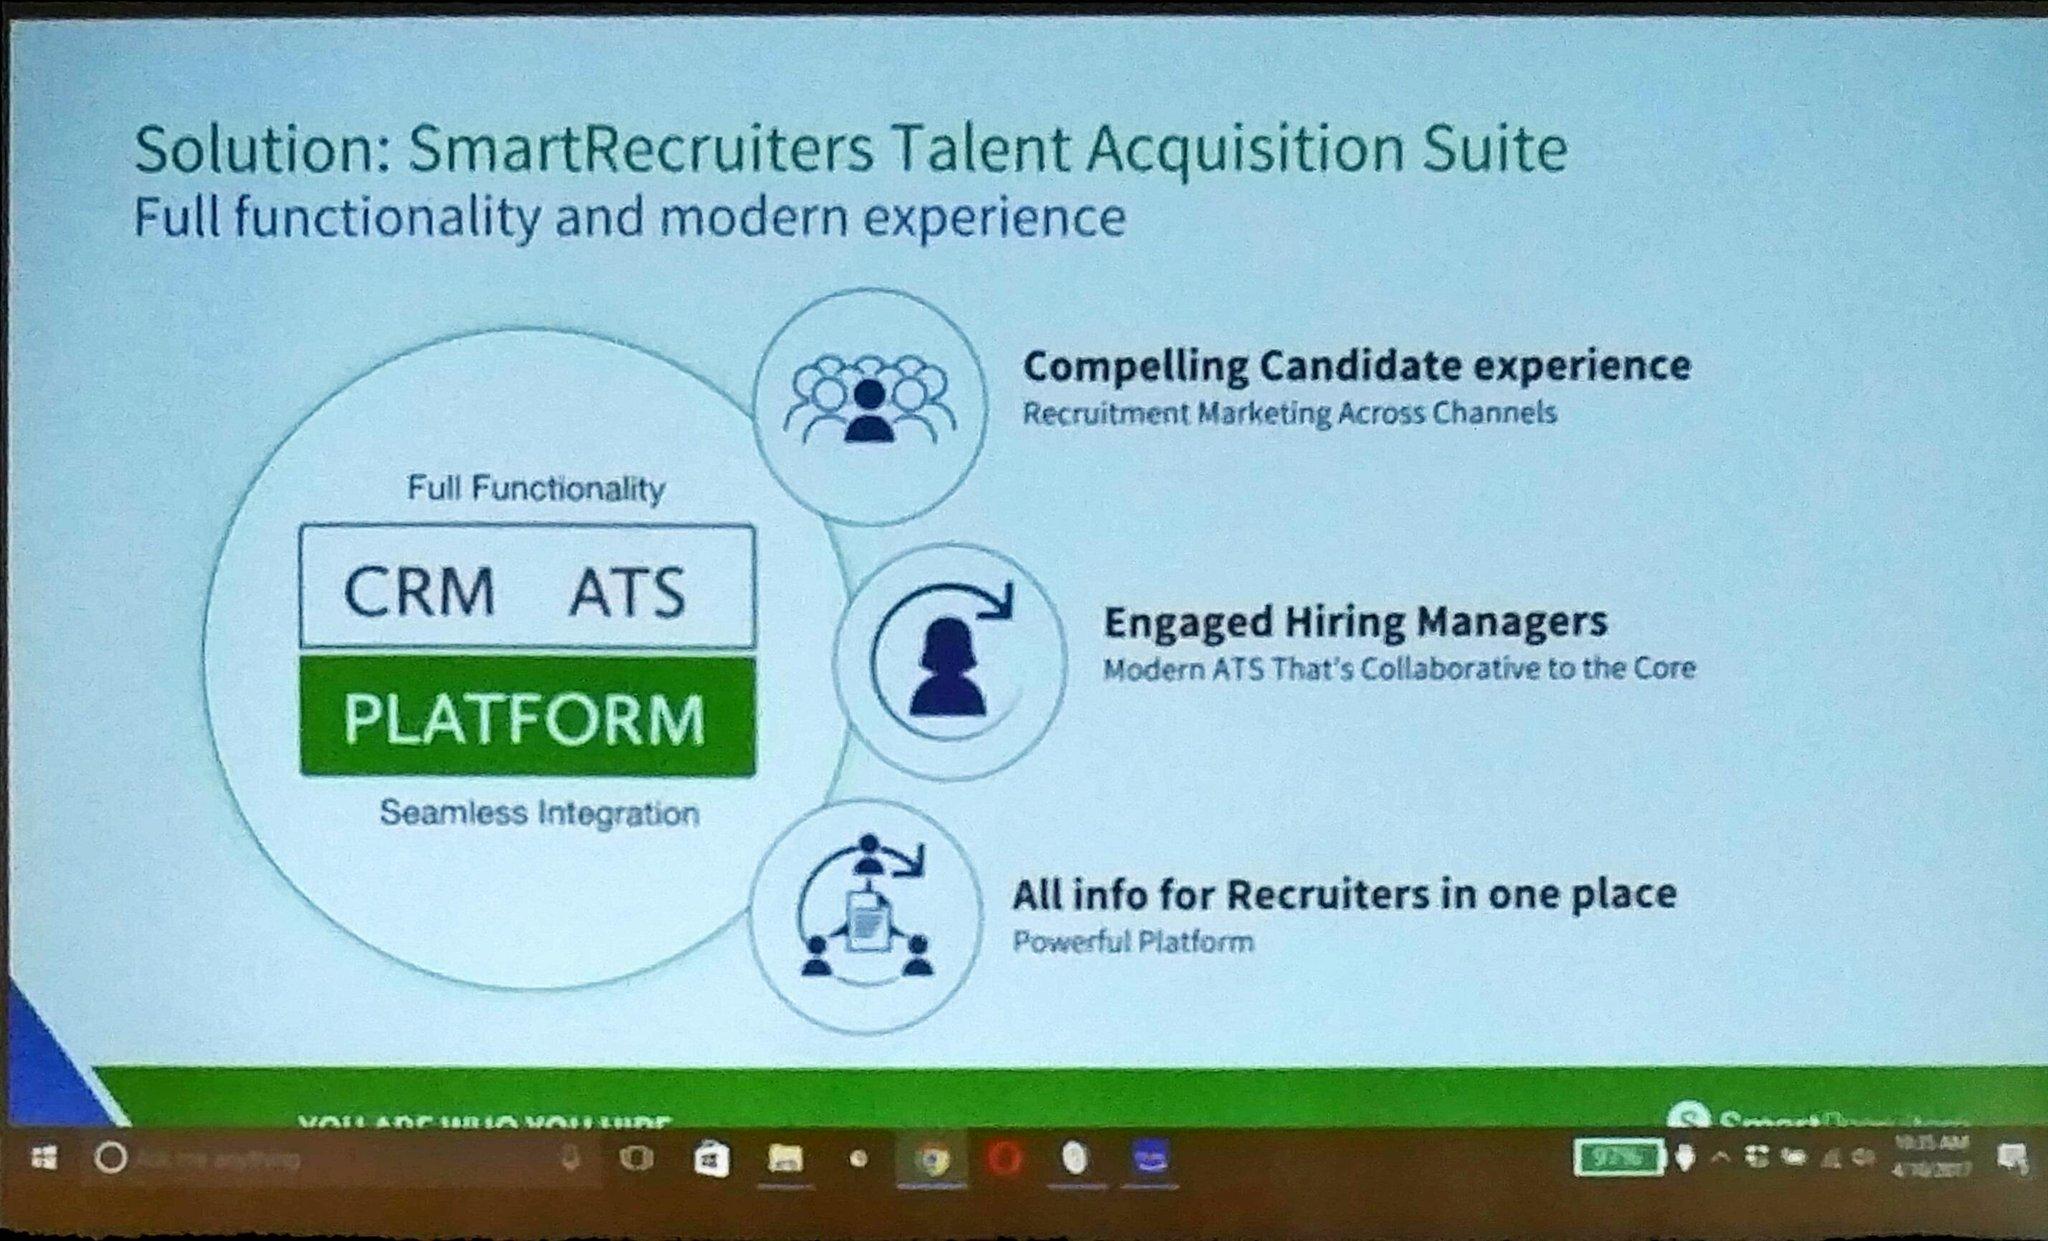 .@jerometernynck solution: @SmartRecruiters  platform w - Cross channel recruiting marketing - collaborative ATS - powerful platform #hire17 https://t.co/CF9u1bJSYc